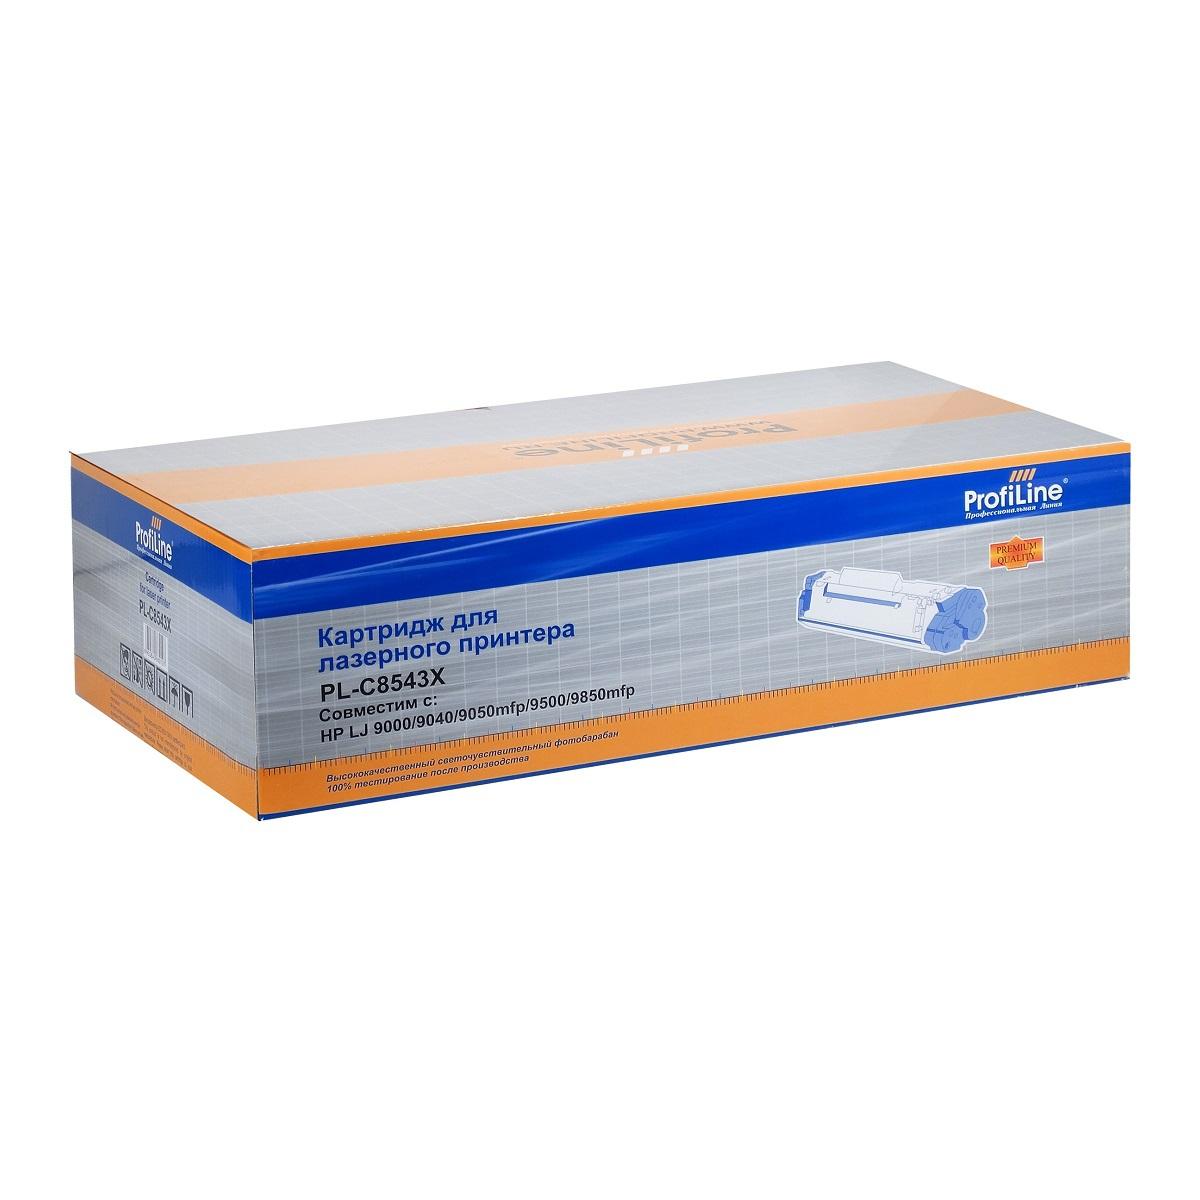 Картридж ProfiLine PL-MLT-D101S / PL-MLT-101S for Samsung ML2161/2156/2160W/2165W/2167/2168W/SCX3400/3405/3407/3400F/3405F/3400FW/3405W/F760P/760 1500 копий